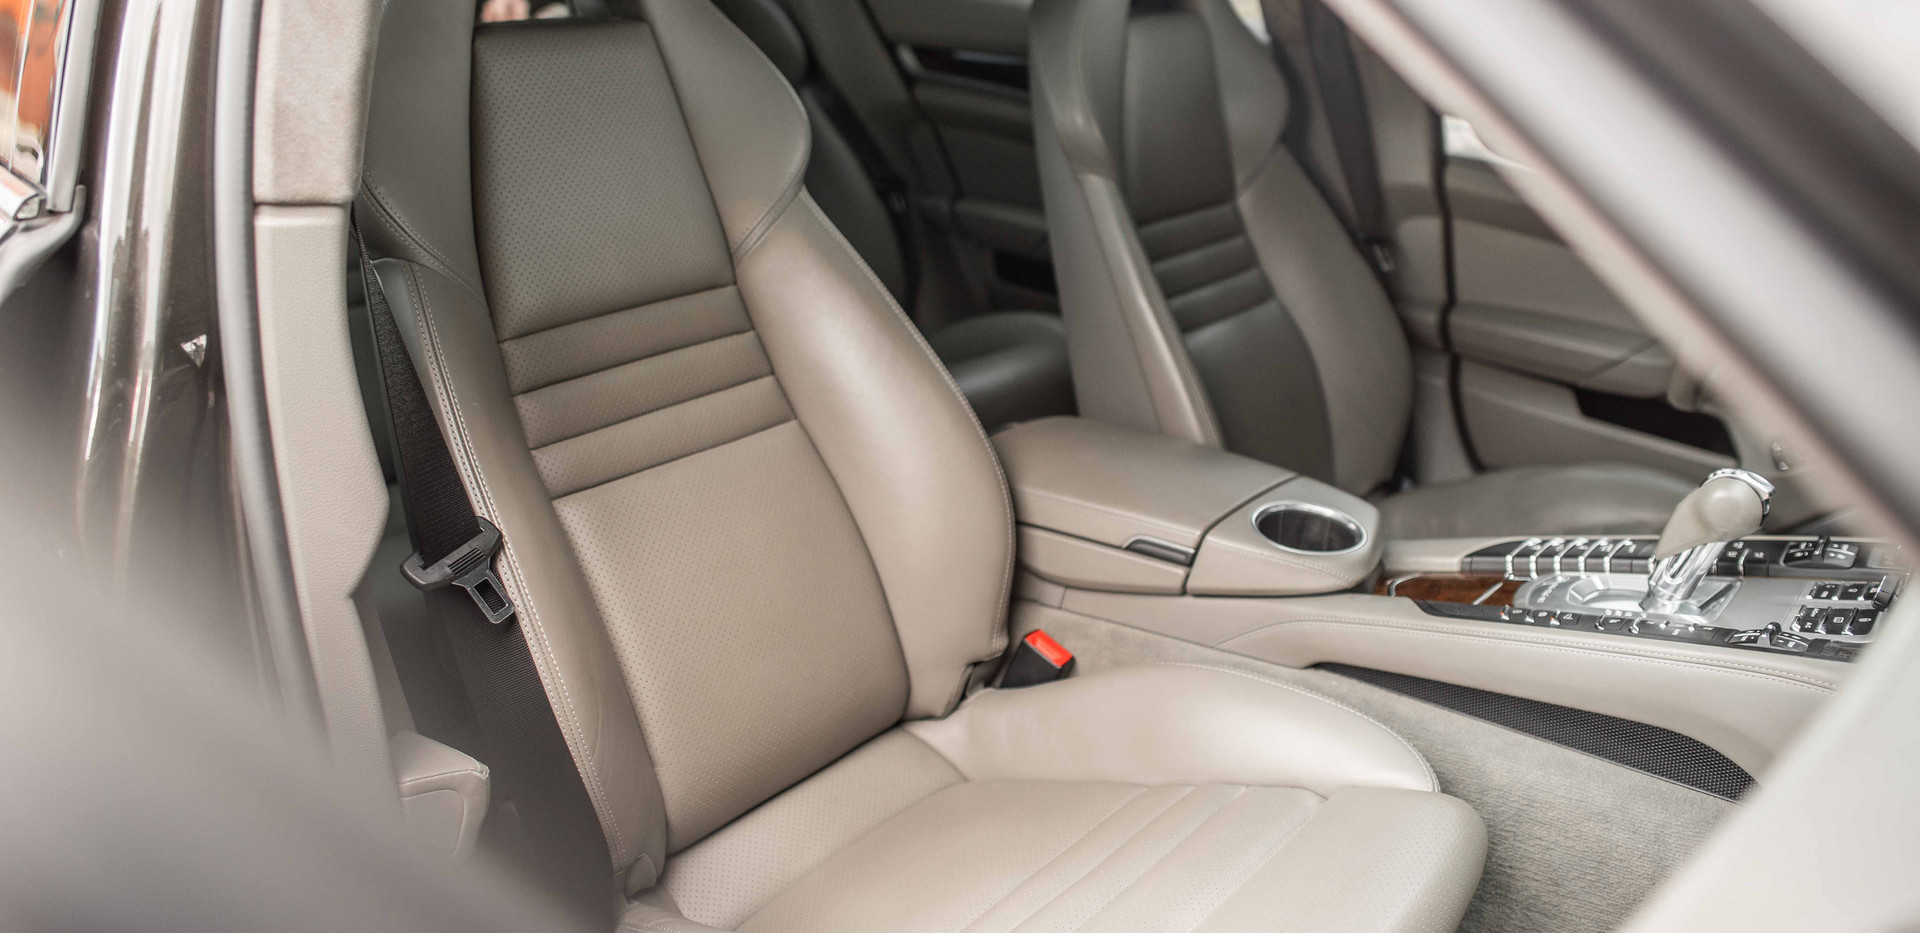 Interior_Passenger_Front_Seats_Panamara.